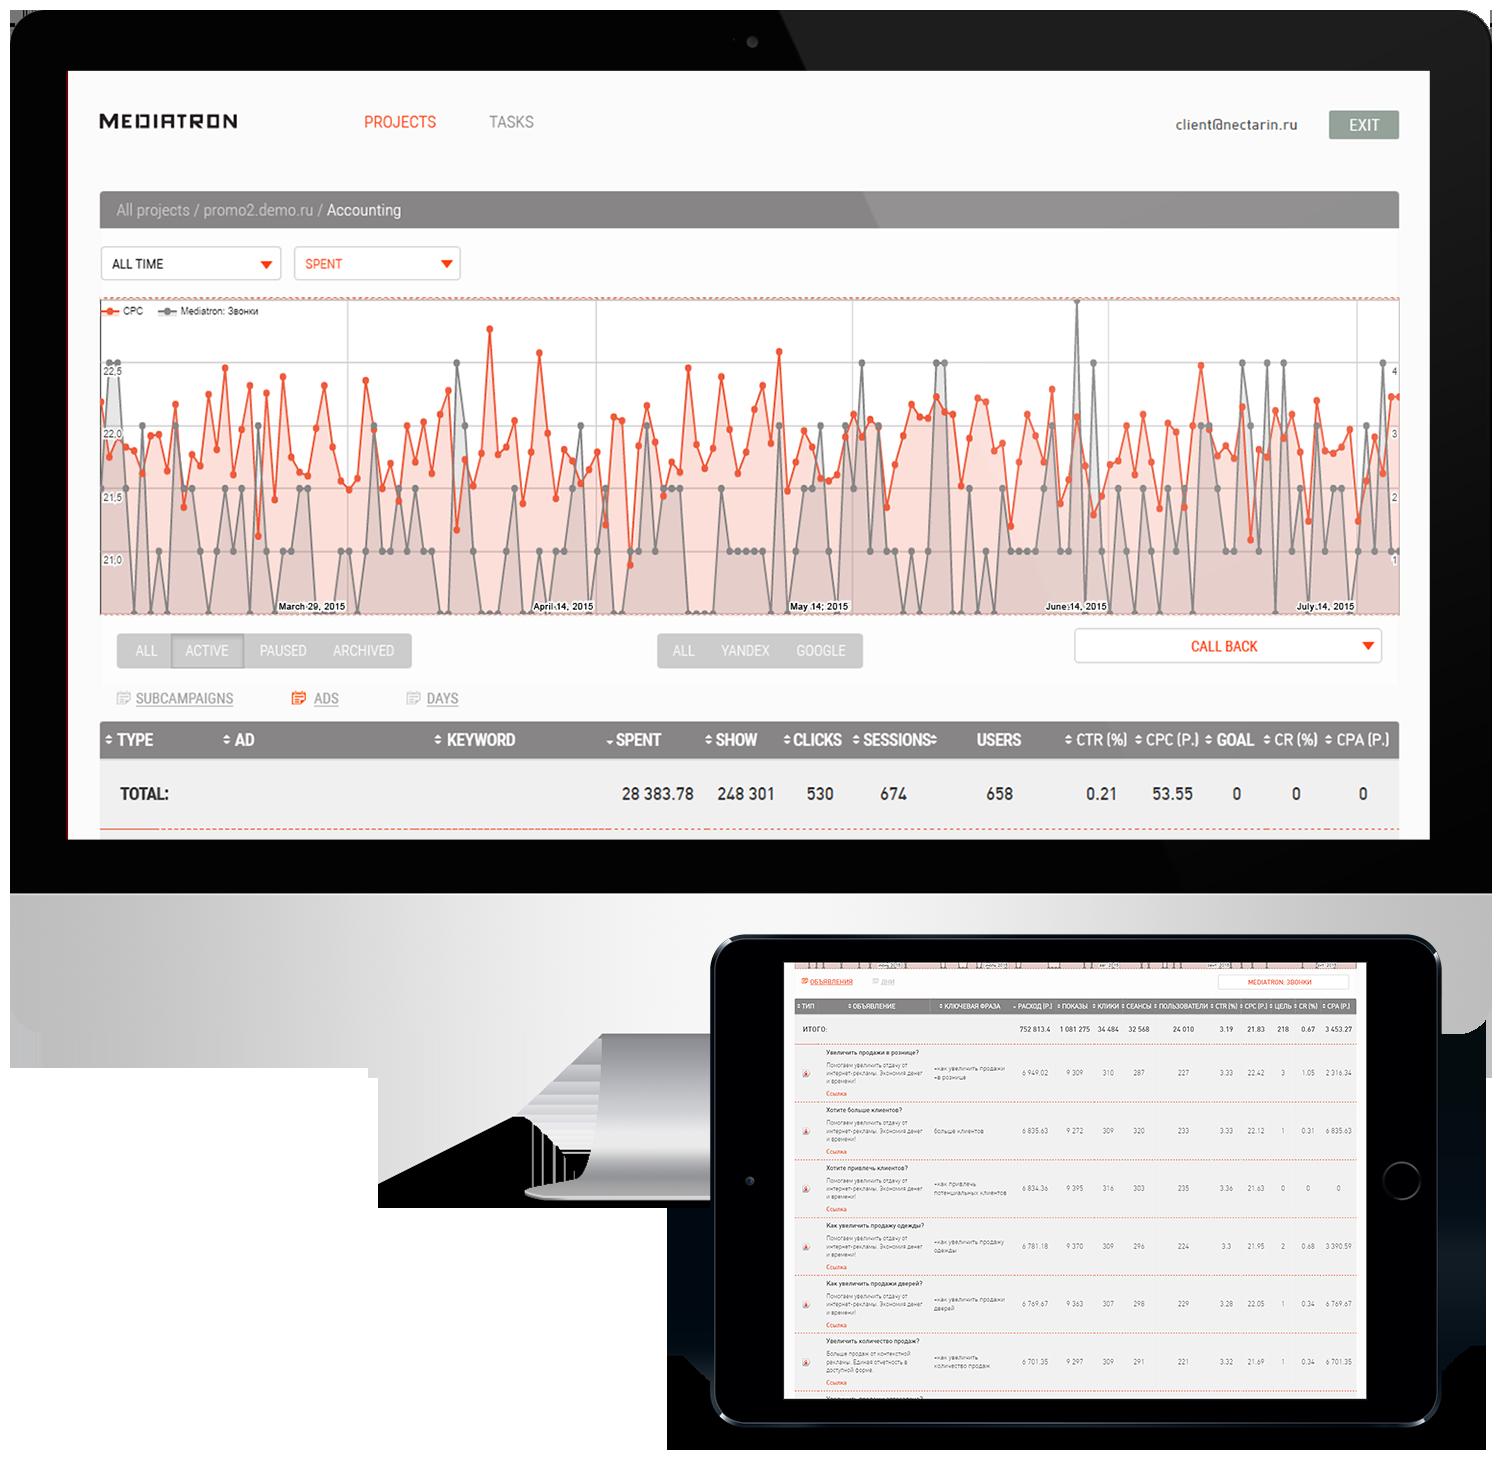 Mediatron: Online Advertising Management Platform